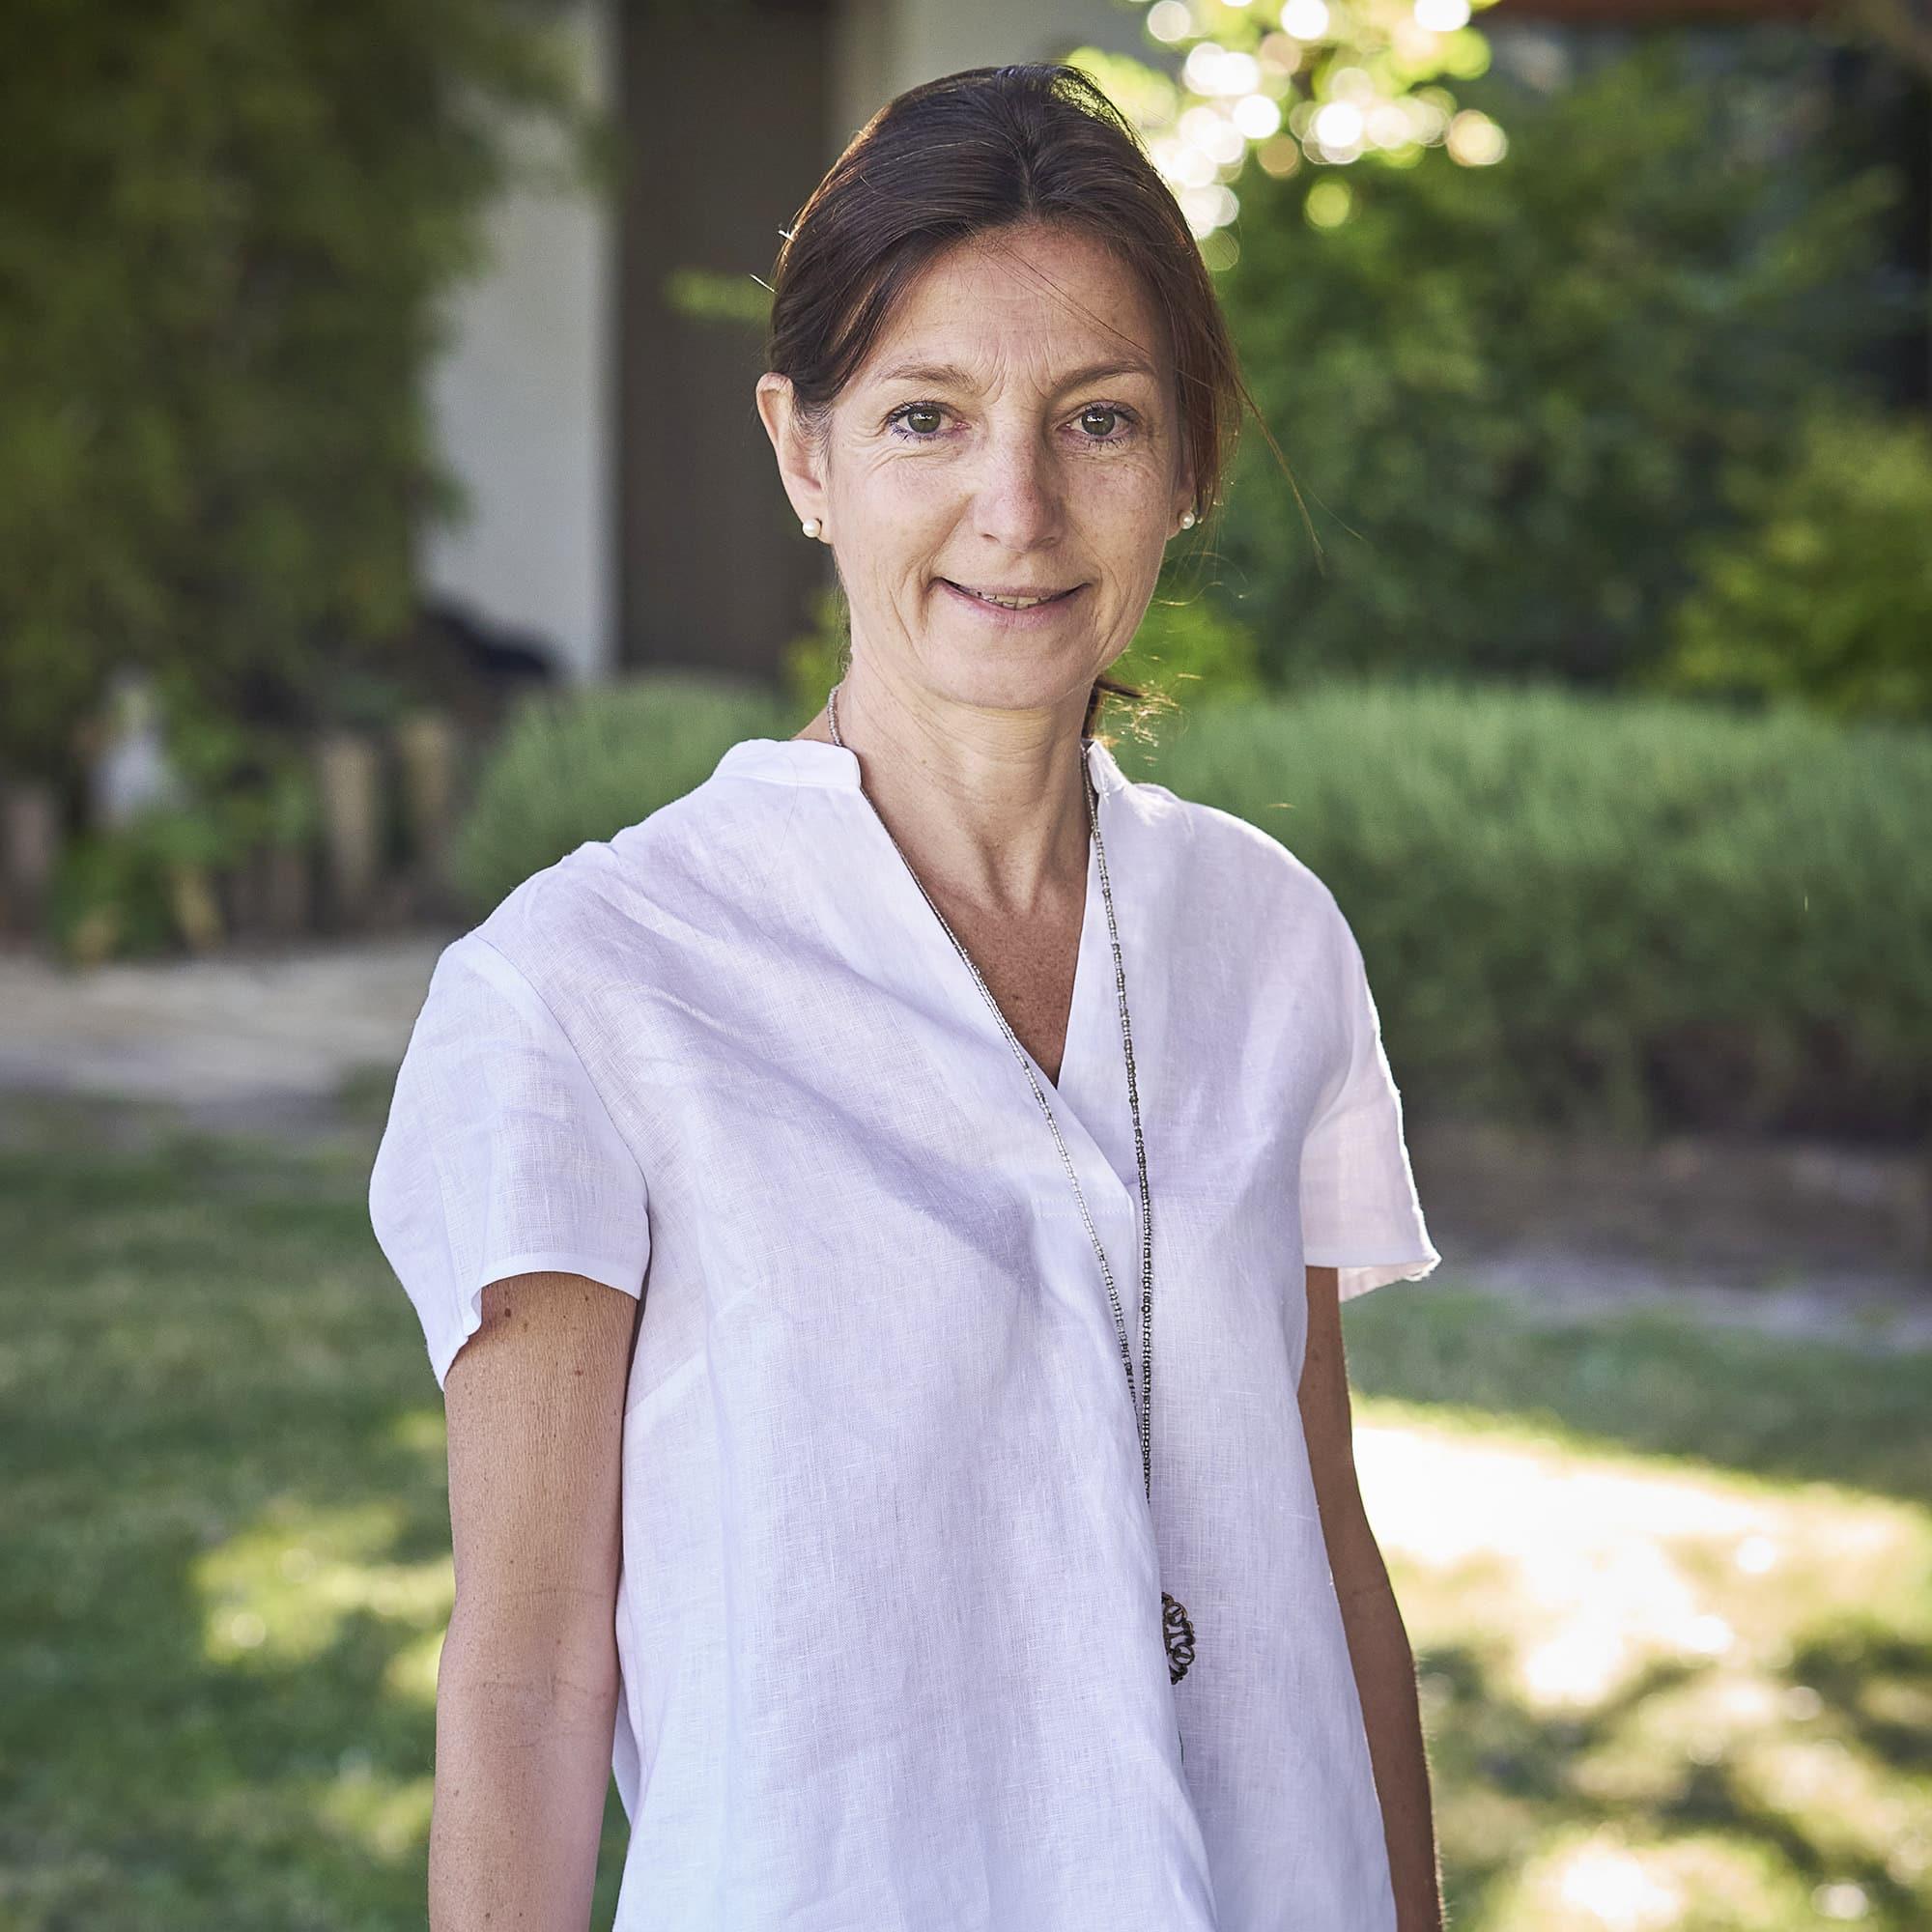 Ana Imaz Eizaguirre